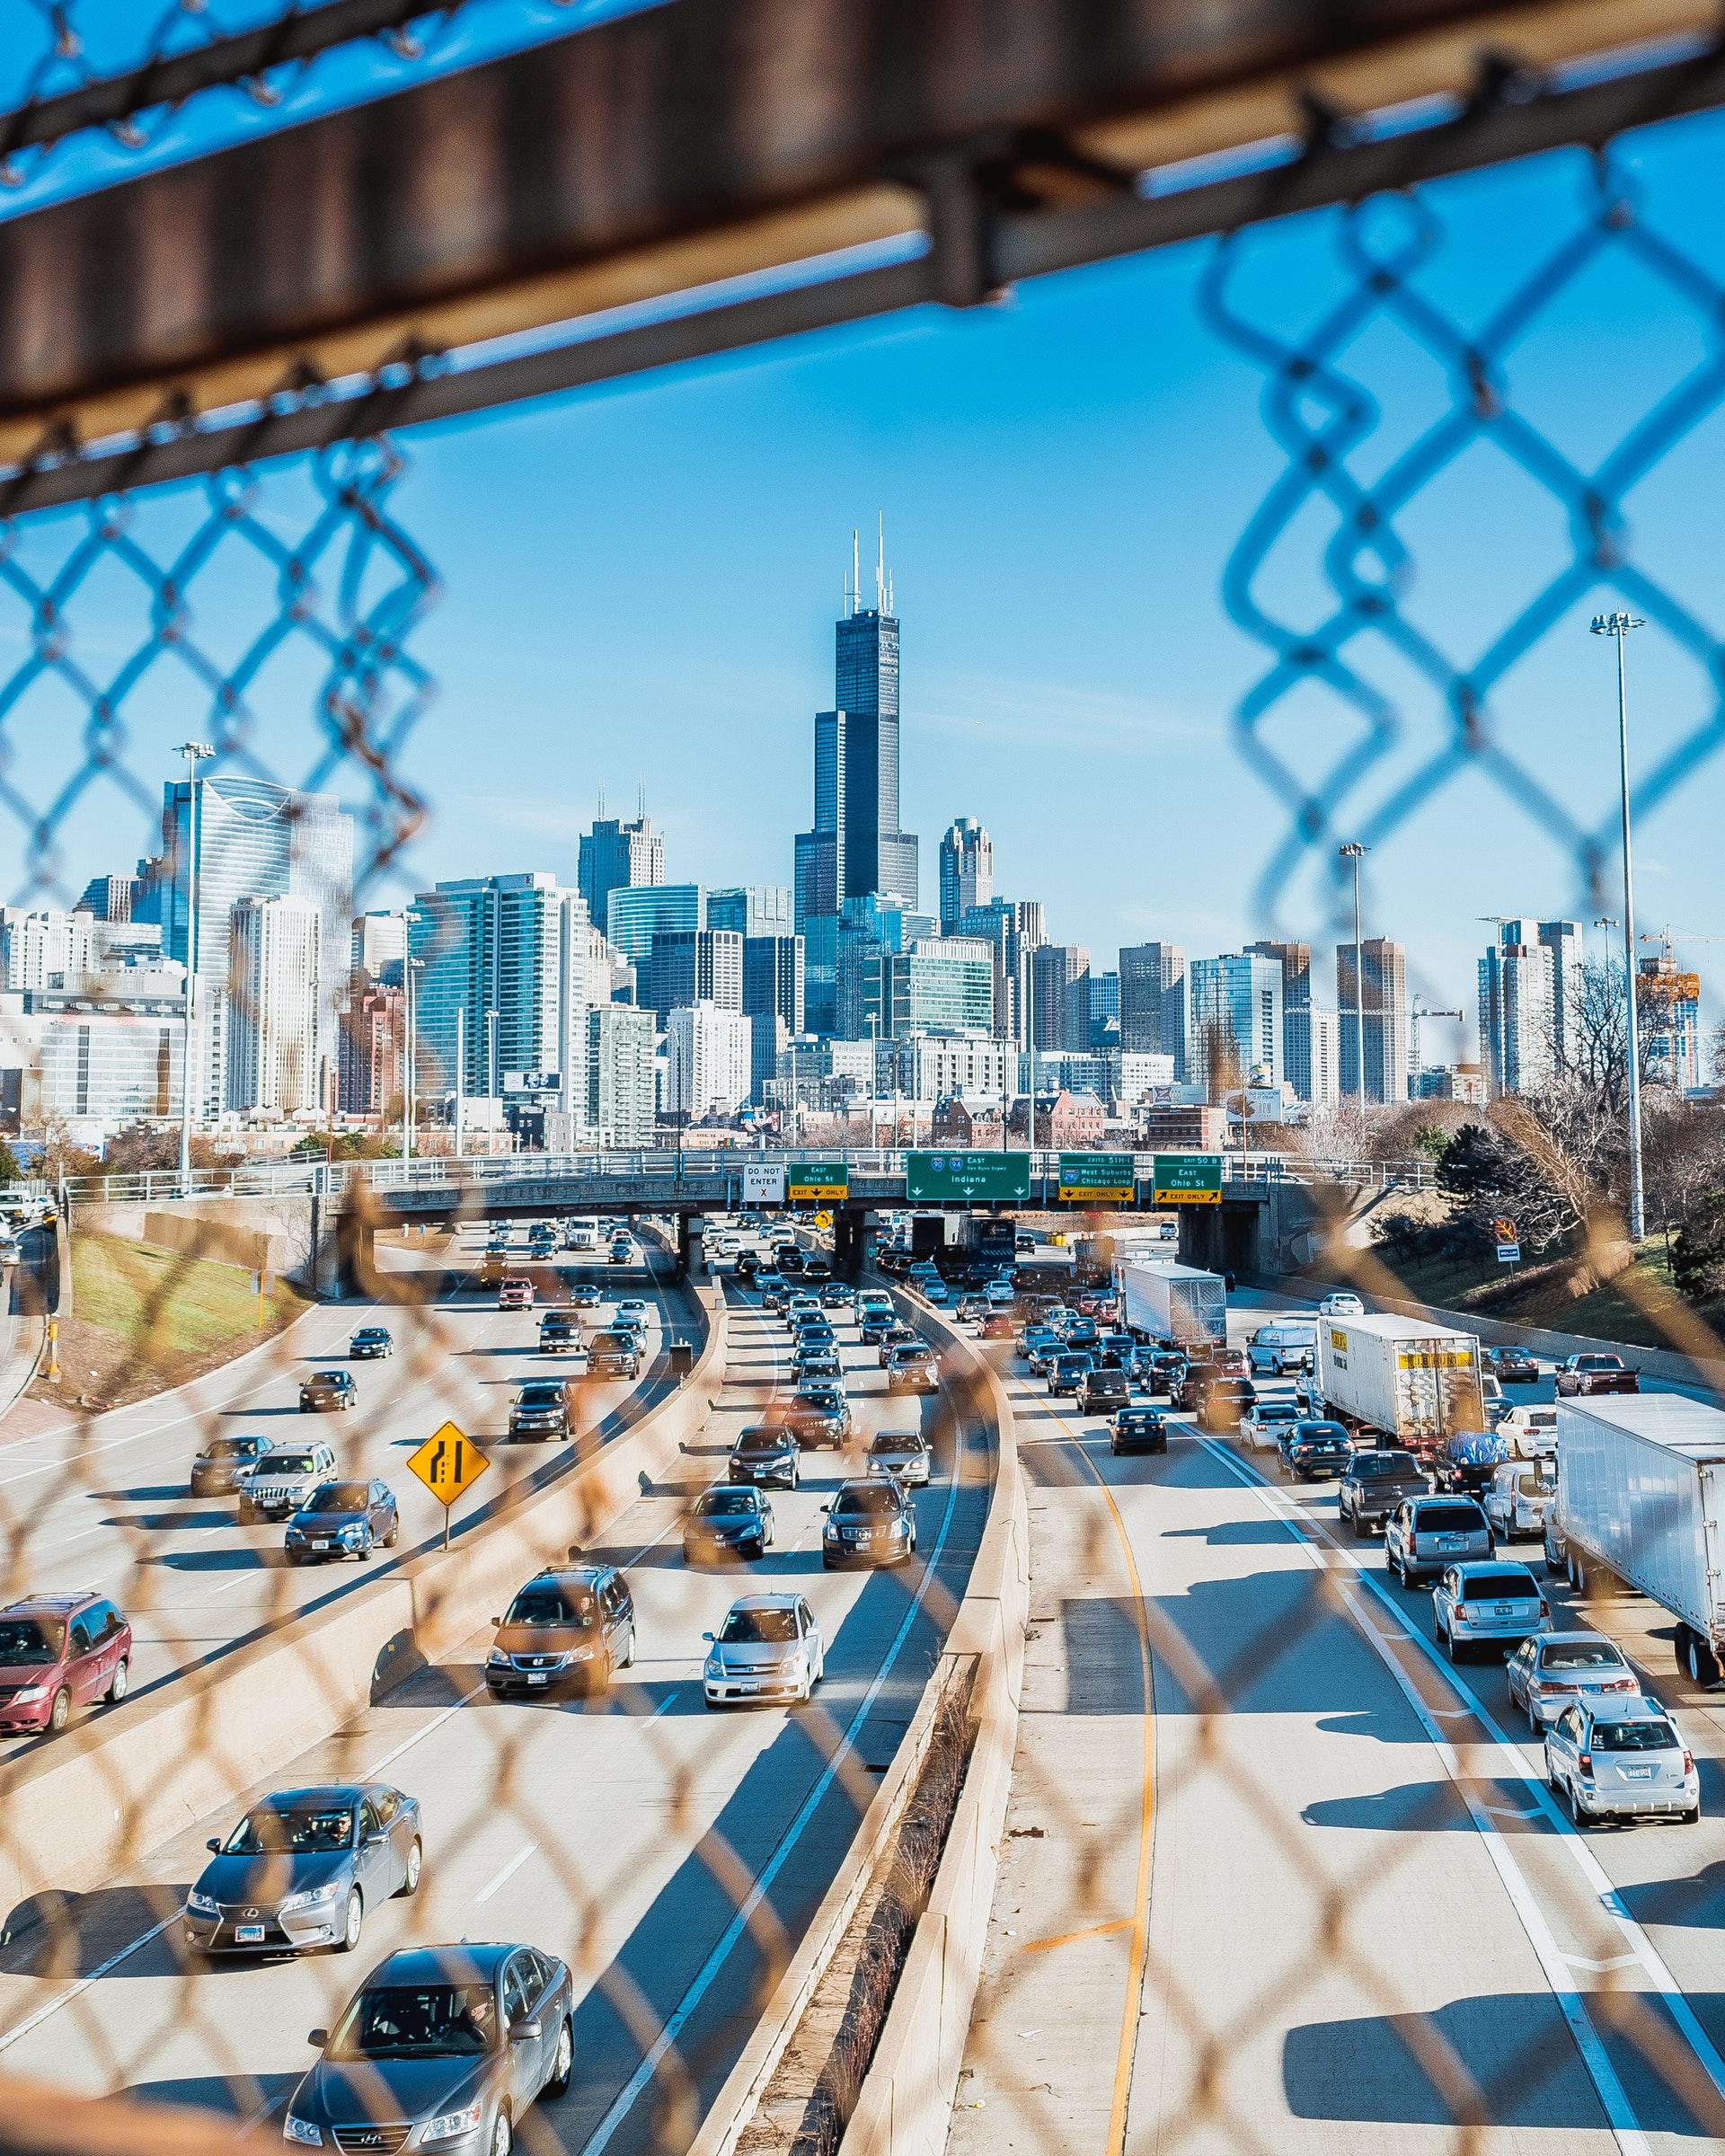 Work-From-Home Traffic Index 2020 - Post-Coronavis (COVID-19)